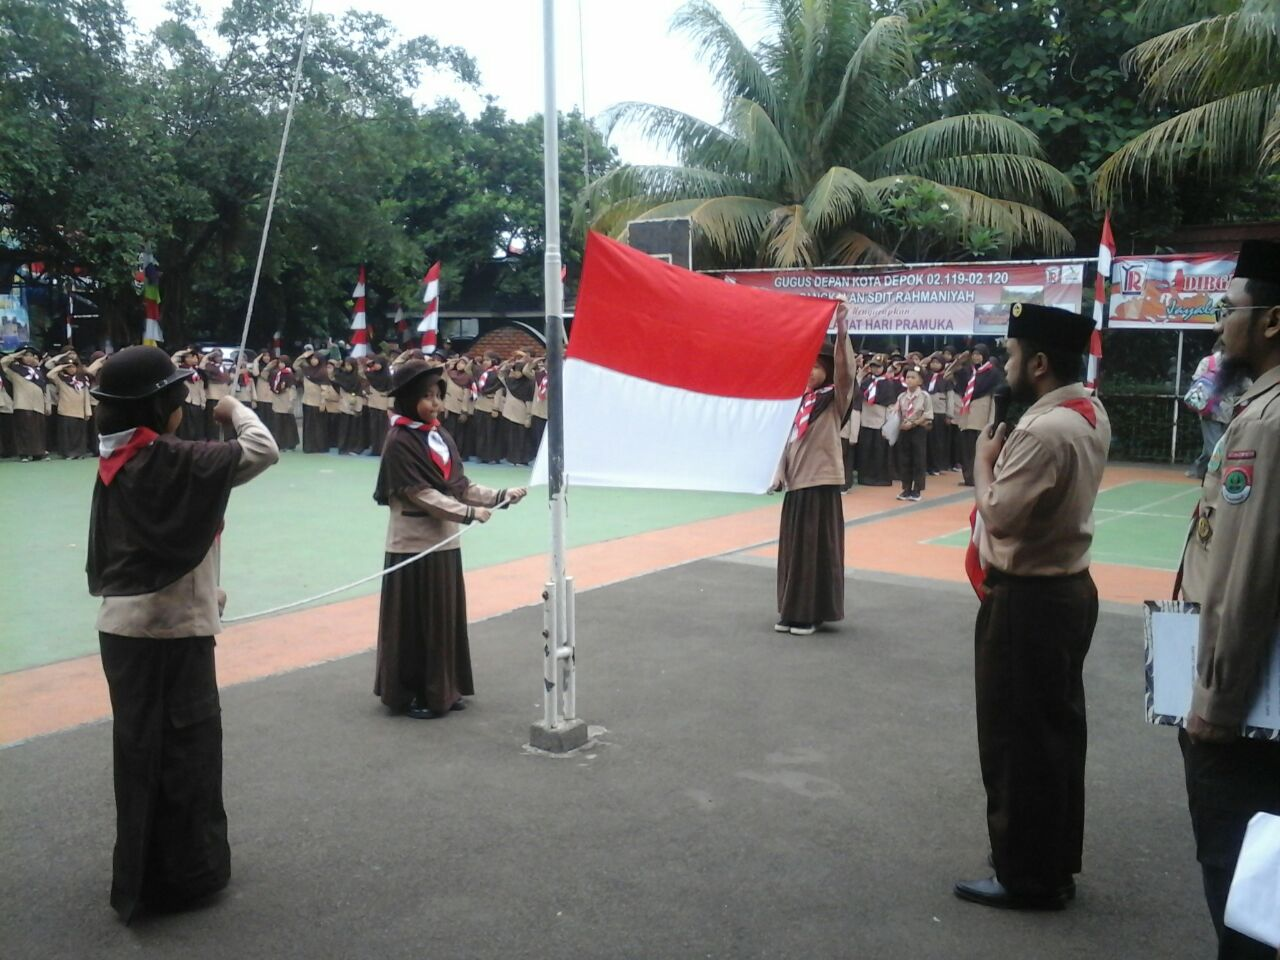 Upacara Pramuka Penggalang Sdit Rahmaniyah Aneka Badge Regu Pada Kamis 25 Agustus 2016 Pekan Kali Ini Nampak Adik Berbaris Rapih Di Lapangan Sesuai Dengan